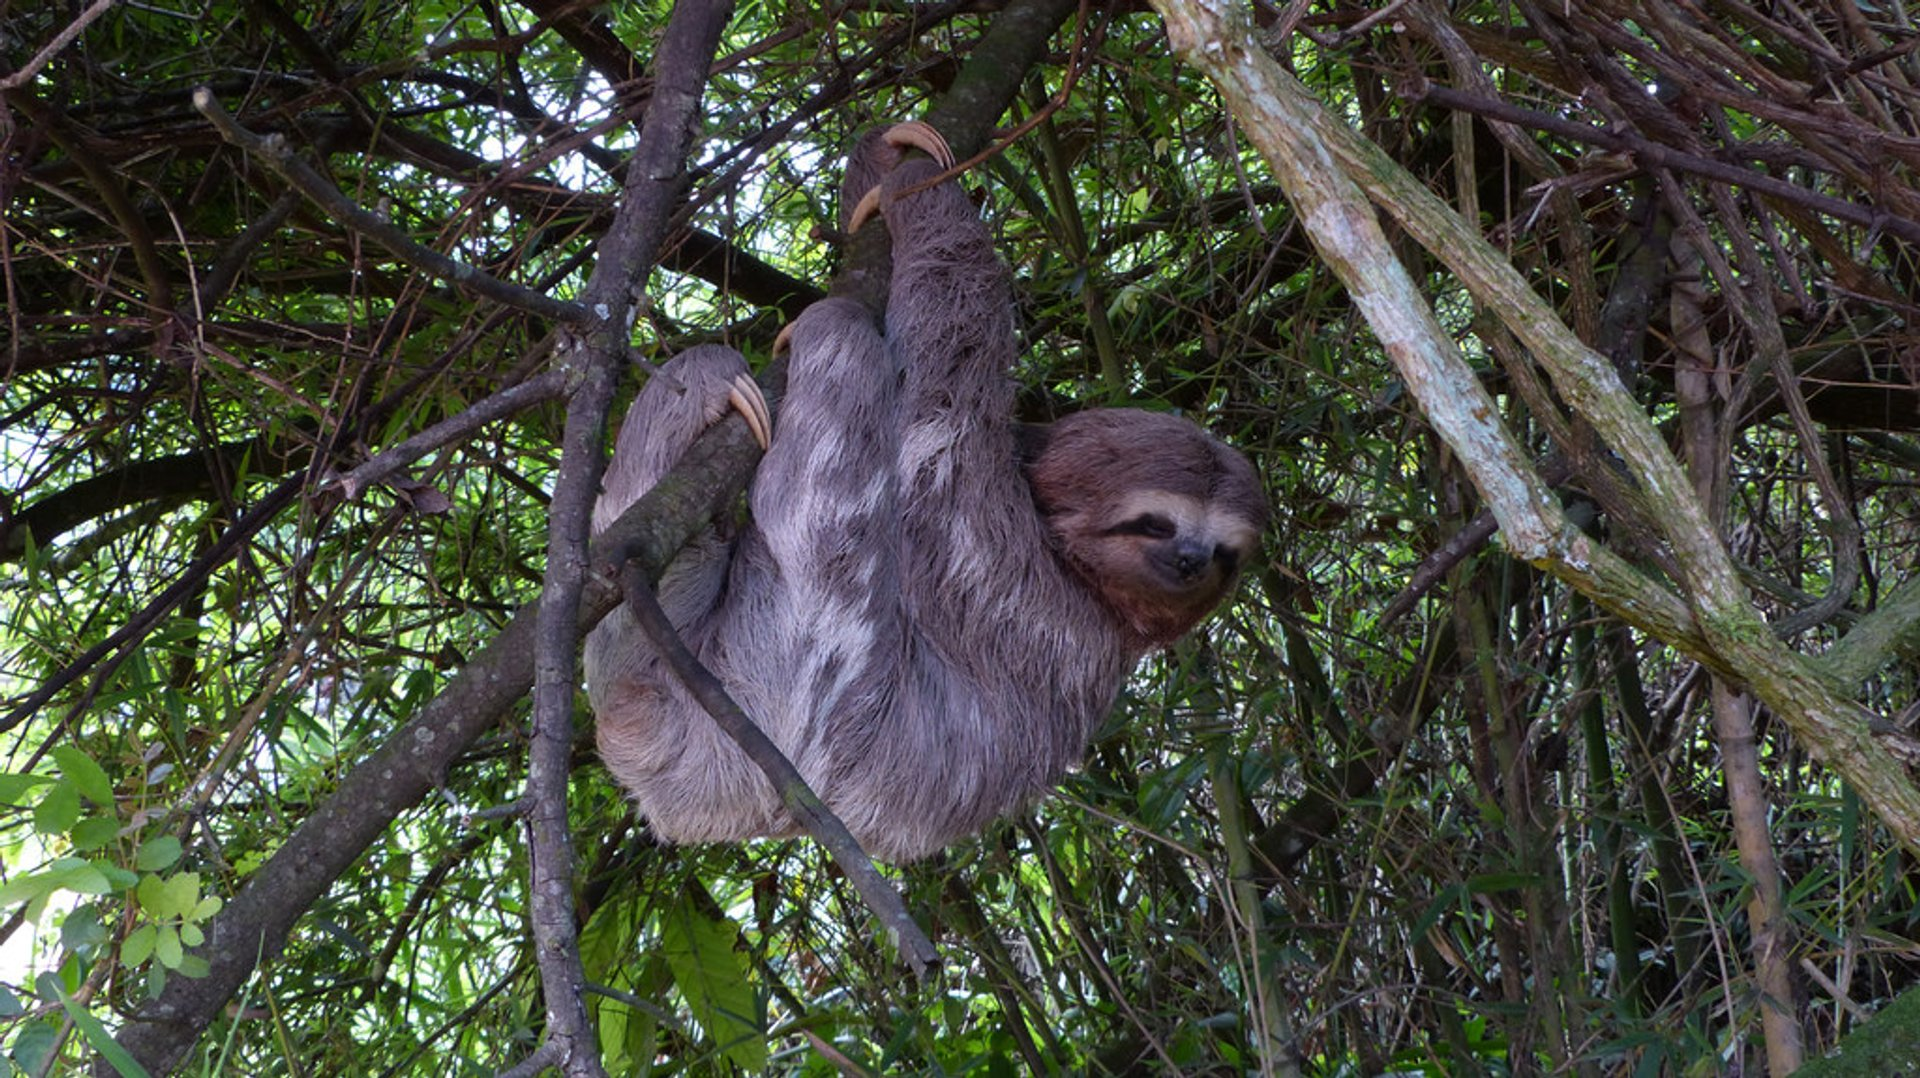 Three-Toed Sloth Mating Season in Rio de Janeiro - Best Season 2019